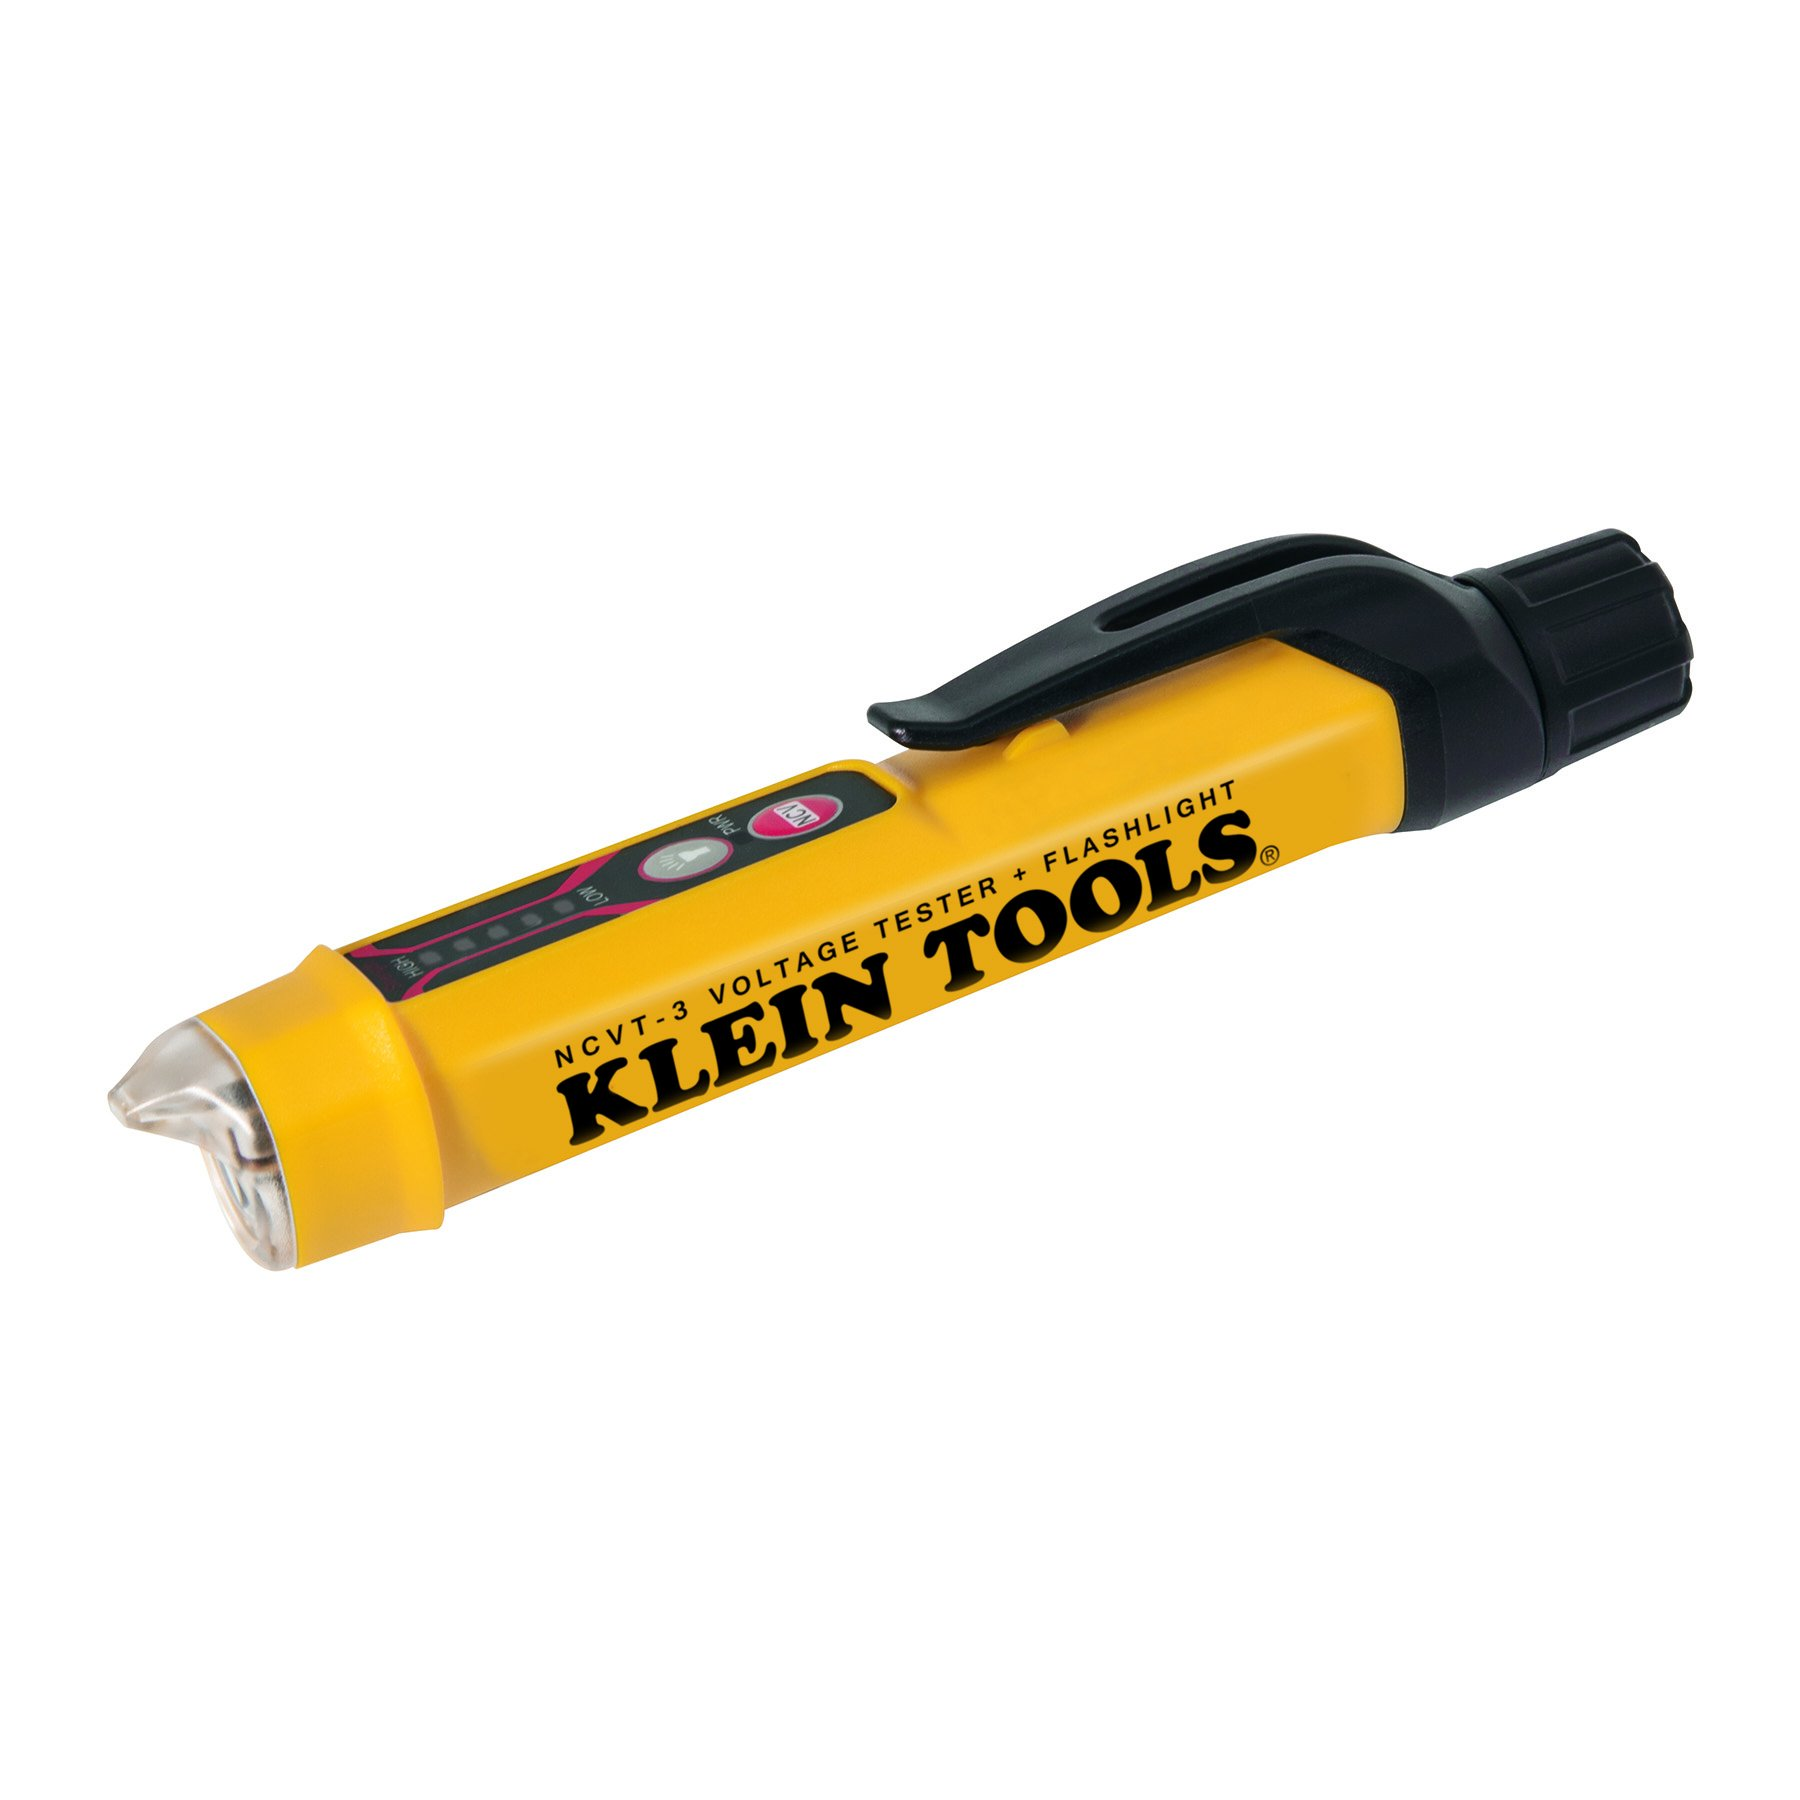 Kleinn Tool NCVT-3 Non-Contact Voltage Tester with Flashlight